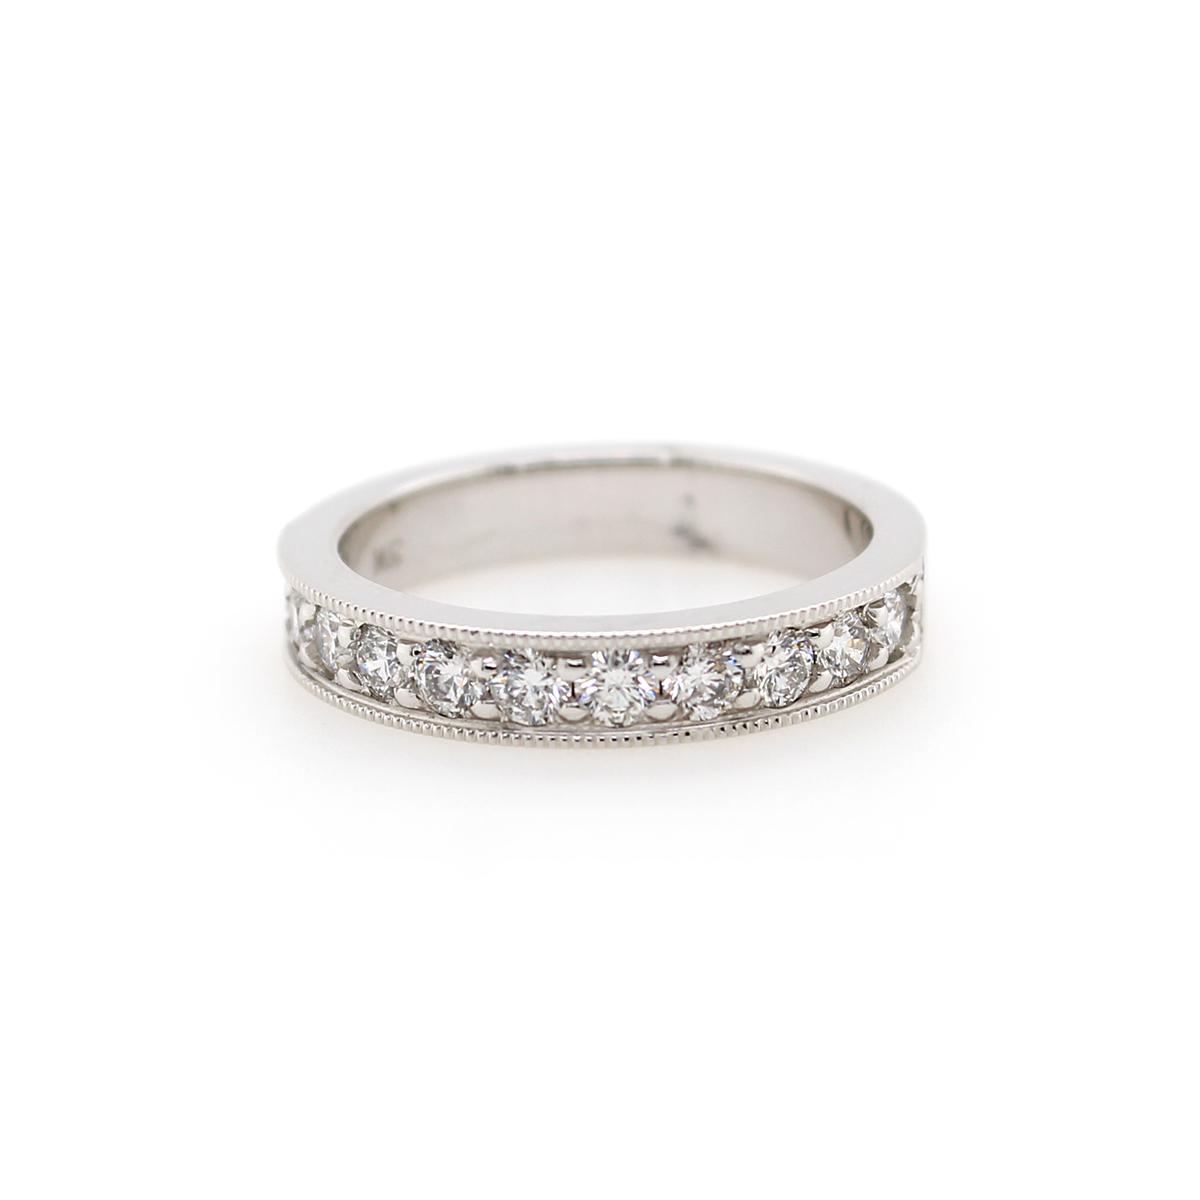 Shefi Diamonds 14 Karat White Gold .75 Carat Millgrain Edge Wedding Band